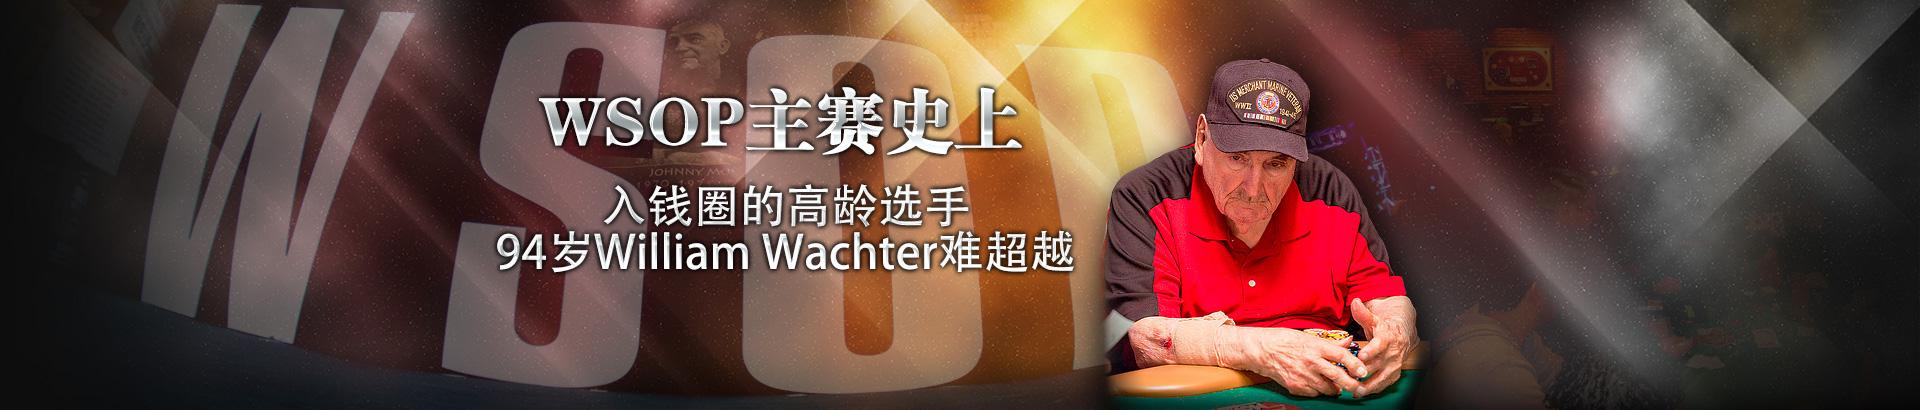 WSOP主赛史上入钱圈的高龄选手 94岁William Wachter难超越